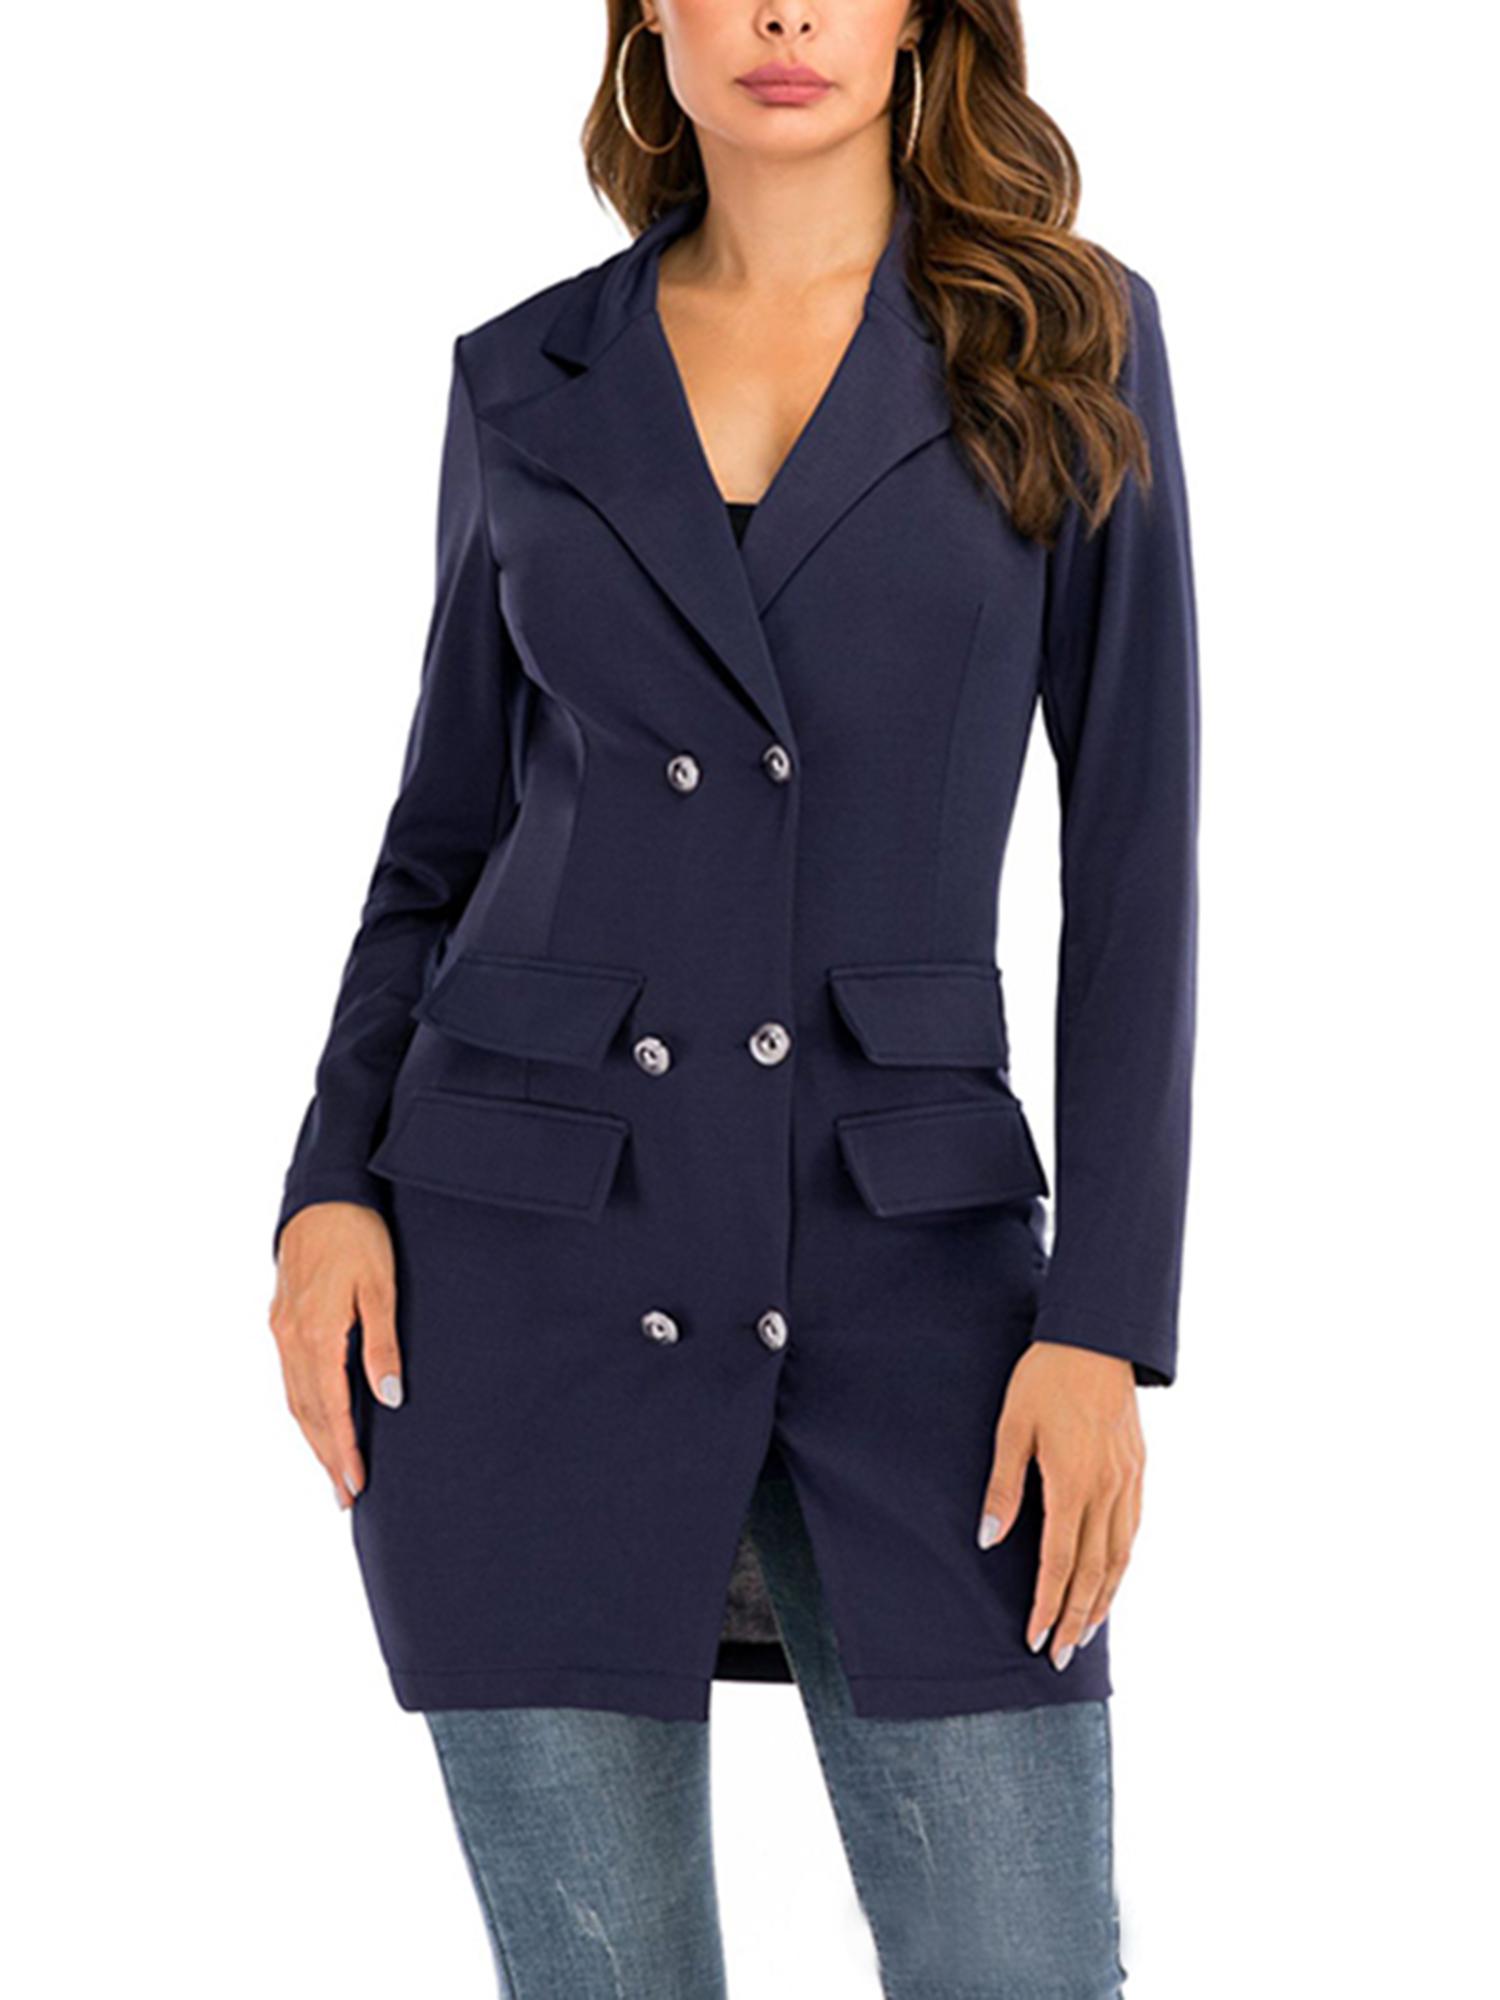 Vintage-Women-Double-Breasted-Plaid-Long-Blazer-Ladies-Jackets-Suits-Coat-Pocket miniatura 35